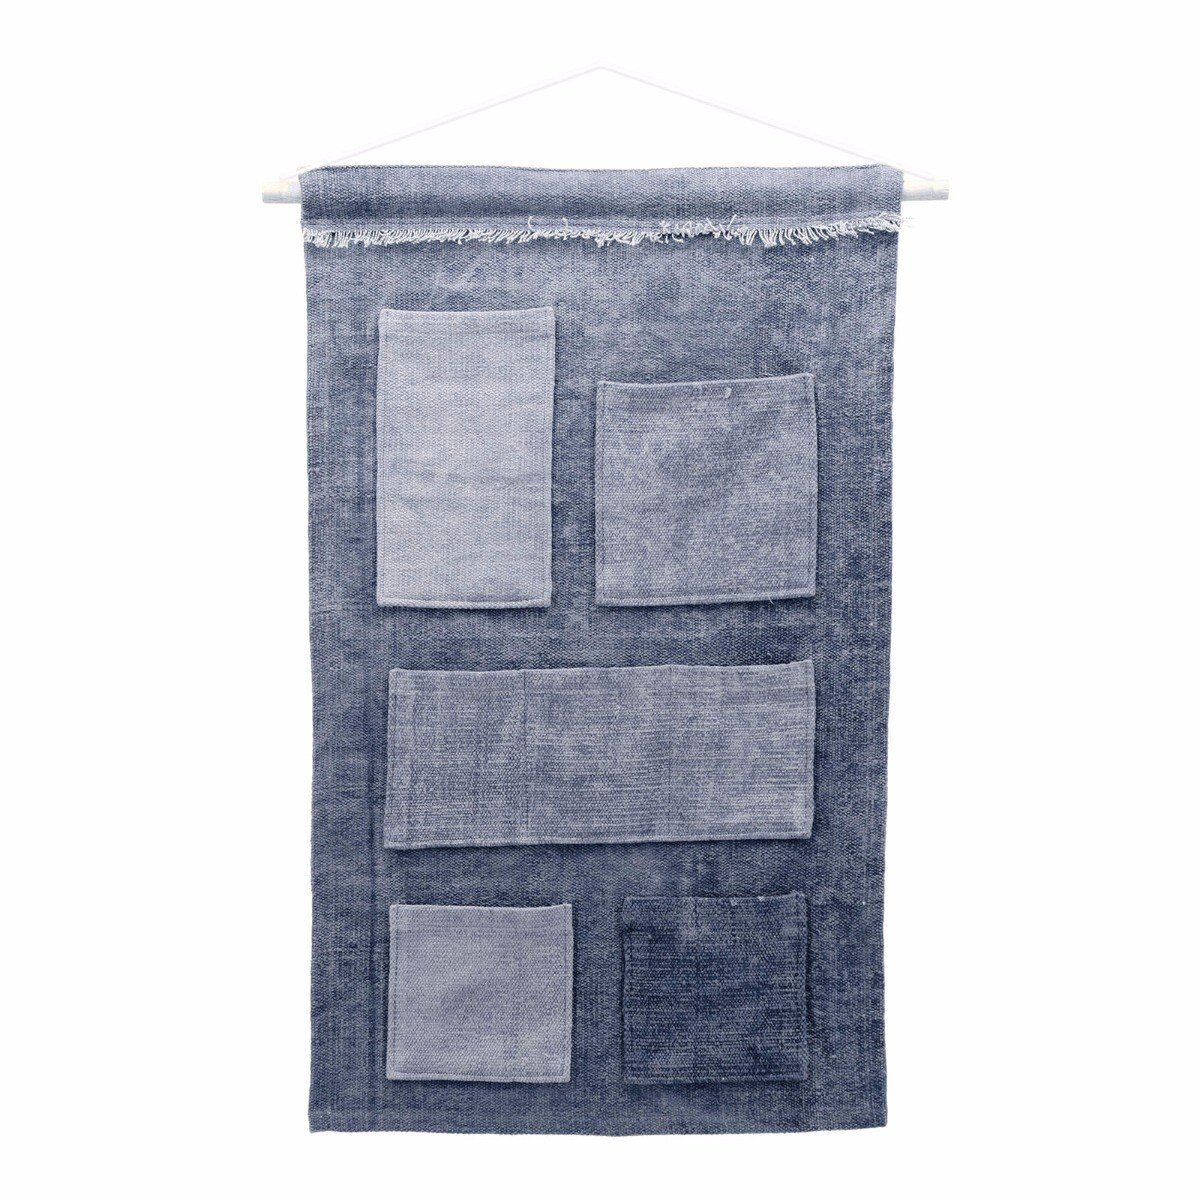 By Boo wandkleed mono blauw 100 x 70